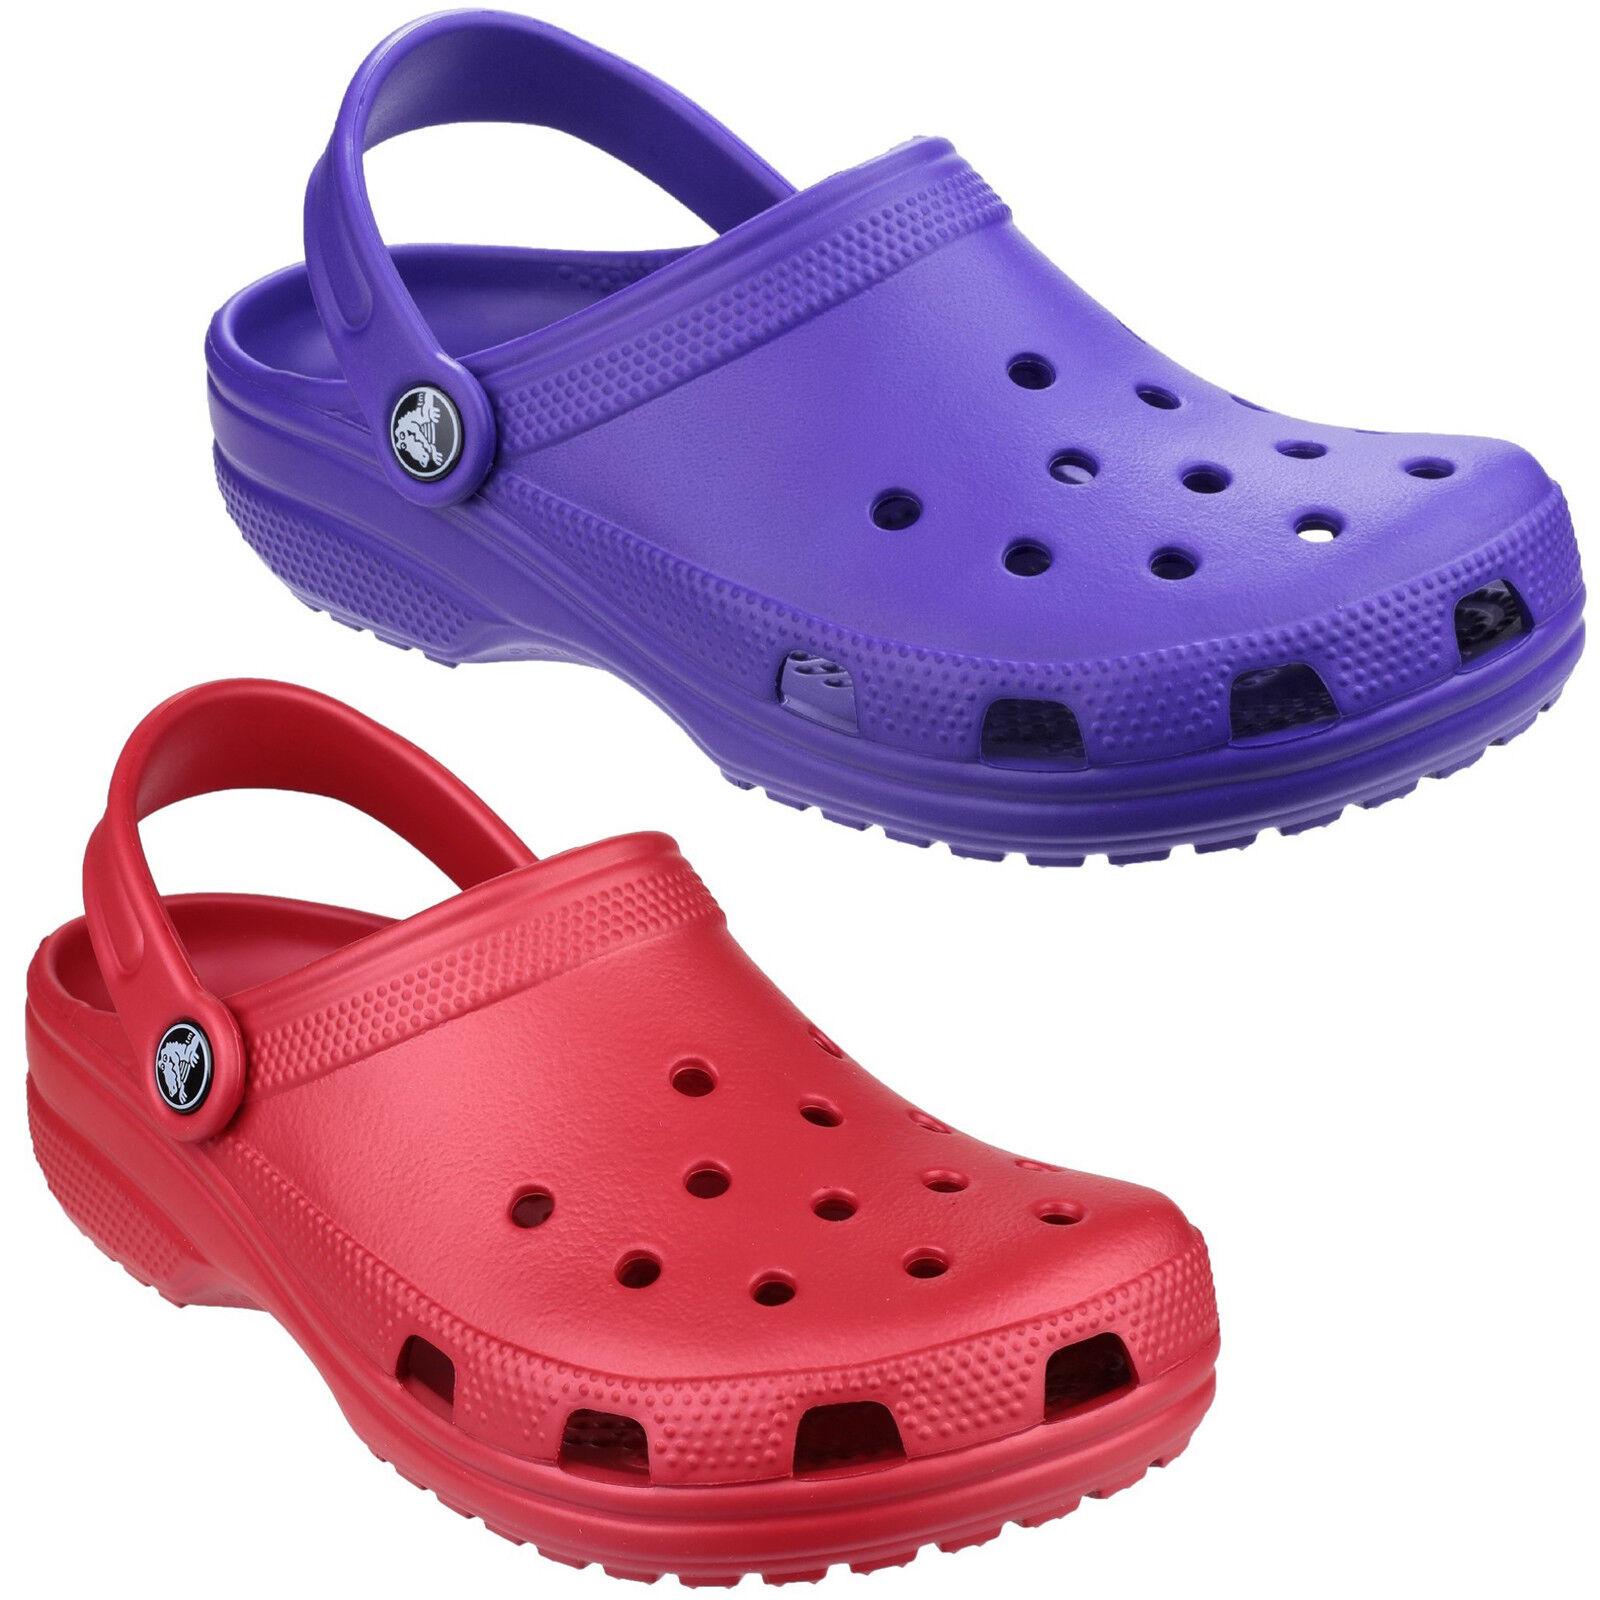 1a5a52e1100c Crocs Classic Clogs Womens Lightweight Croslite Foam Ventilated Massage  Sandals